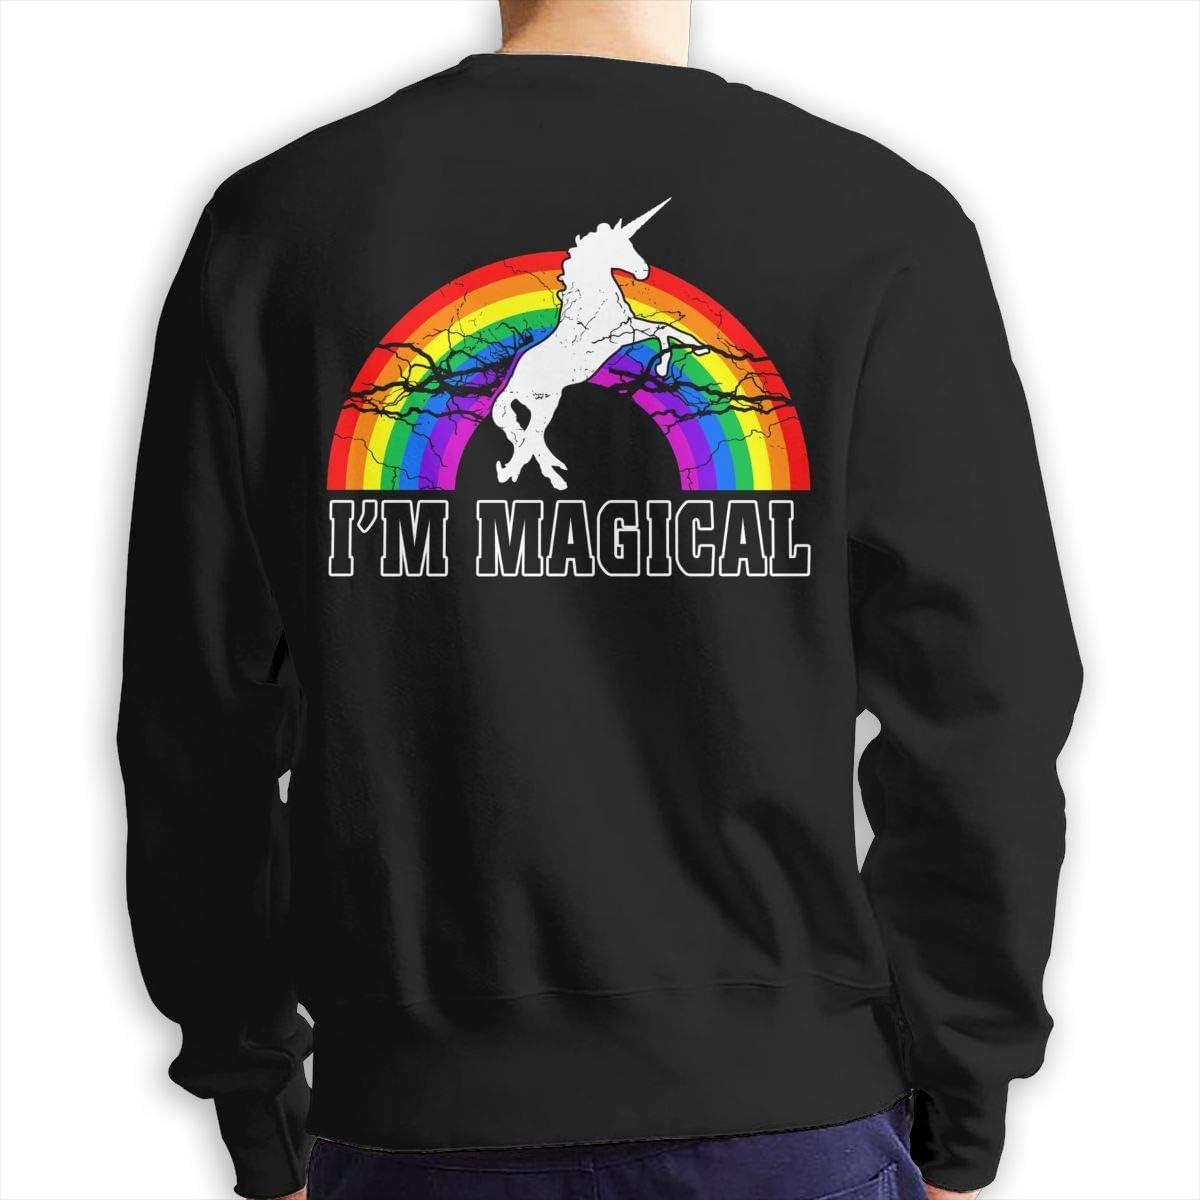 Im Magical Unicorn Rainbow Mens Cotton Casual Double Sides Print Long Sleeve Crewneck Sweatshirt